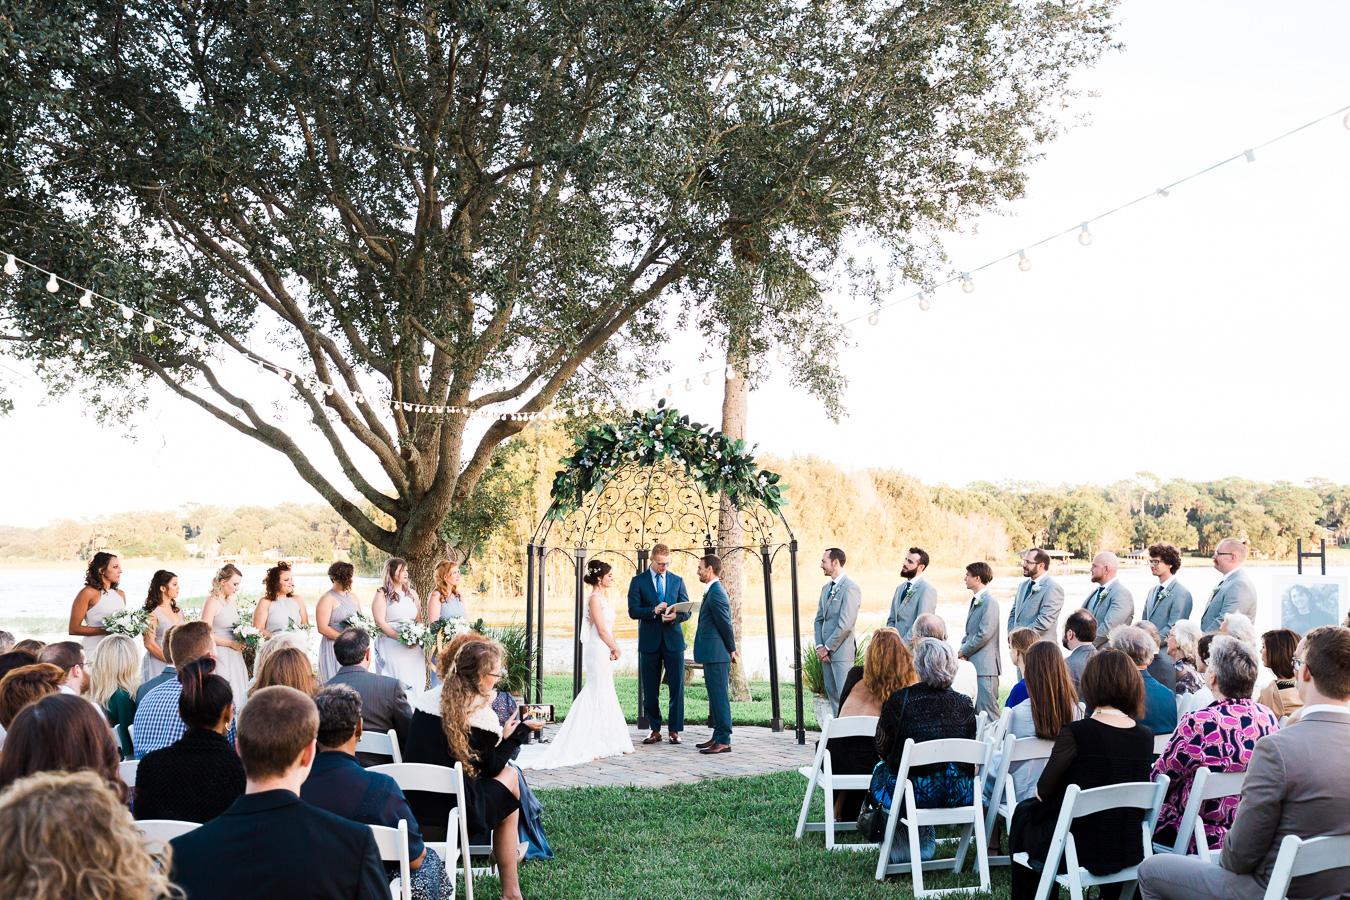 Wedding-photographer-orlando-69.jpg